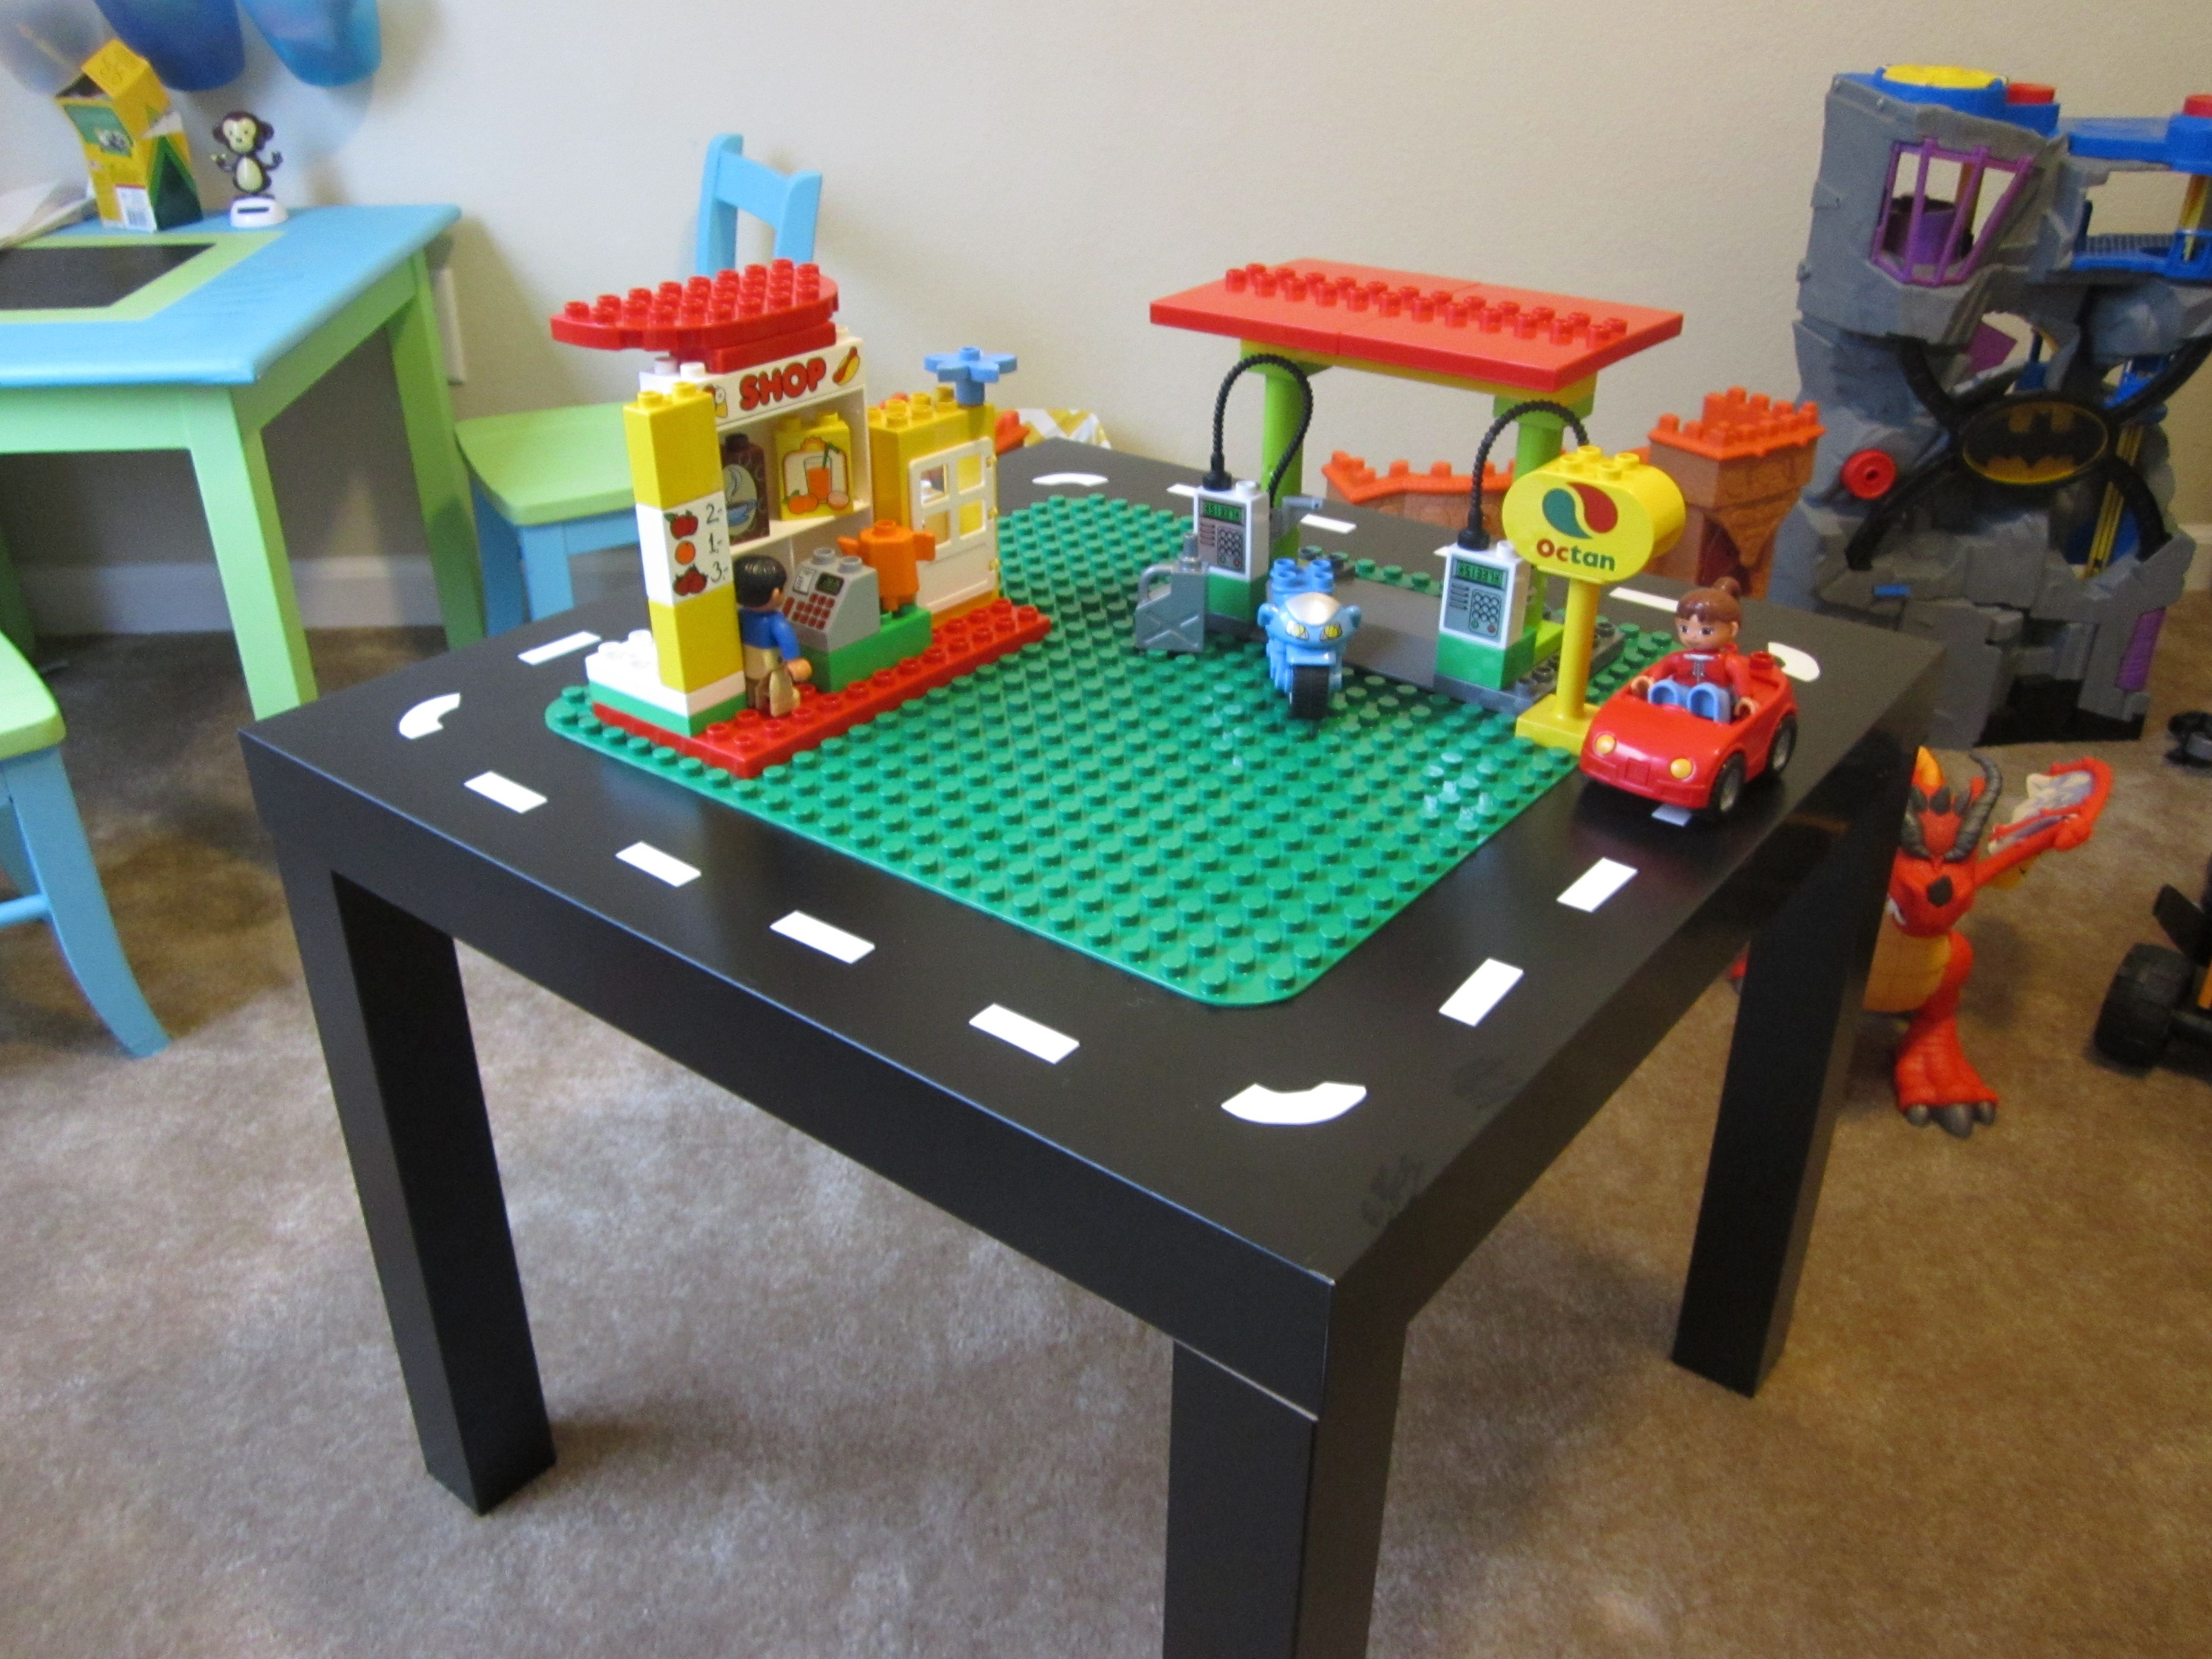 DIY lego duplo table | My Lil\' Man | Pinterest | Lego duplo table ...